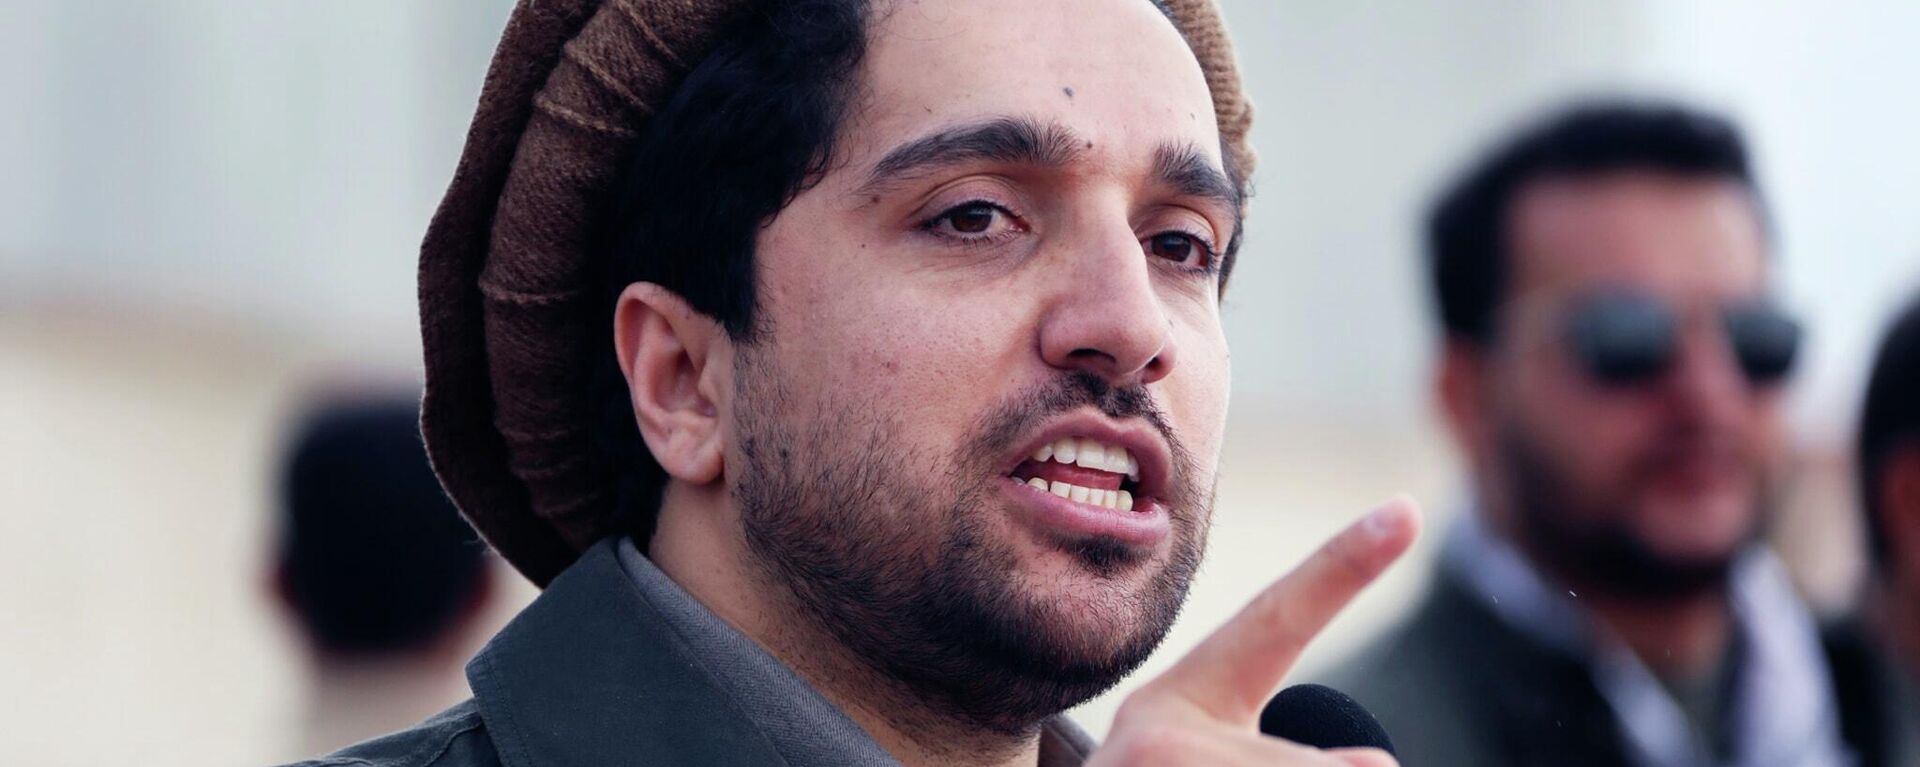 Ахмад Масуд, сын покойного афганского политика и военачальника Ахмад Шаха Масуда - Sputnik Таджикистан, 1920, 15.09.2021